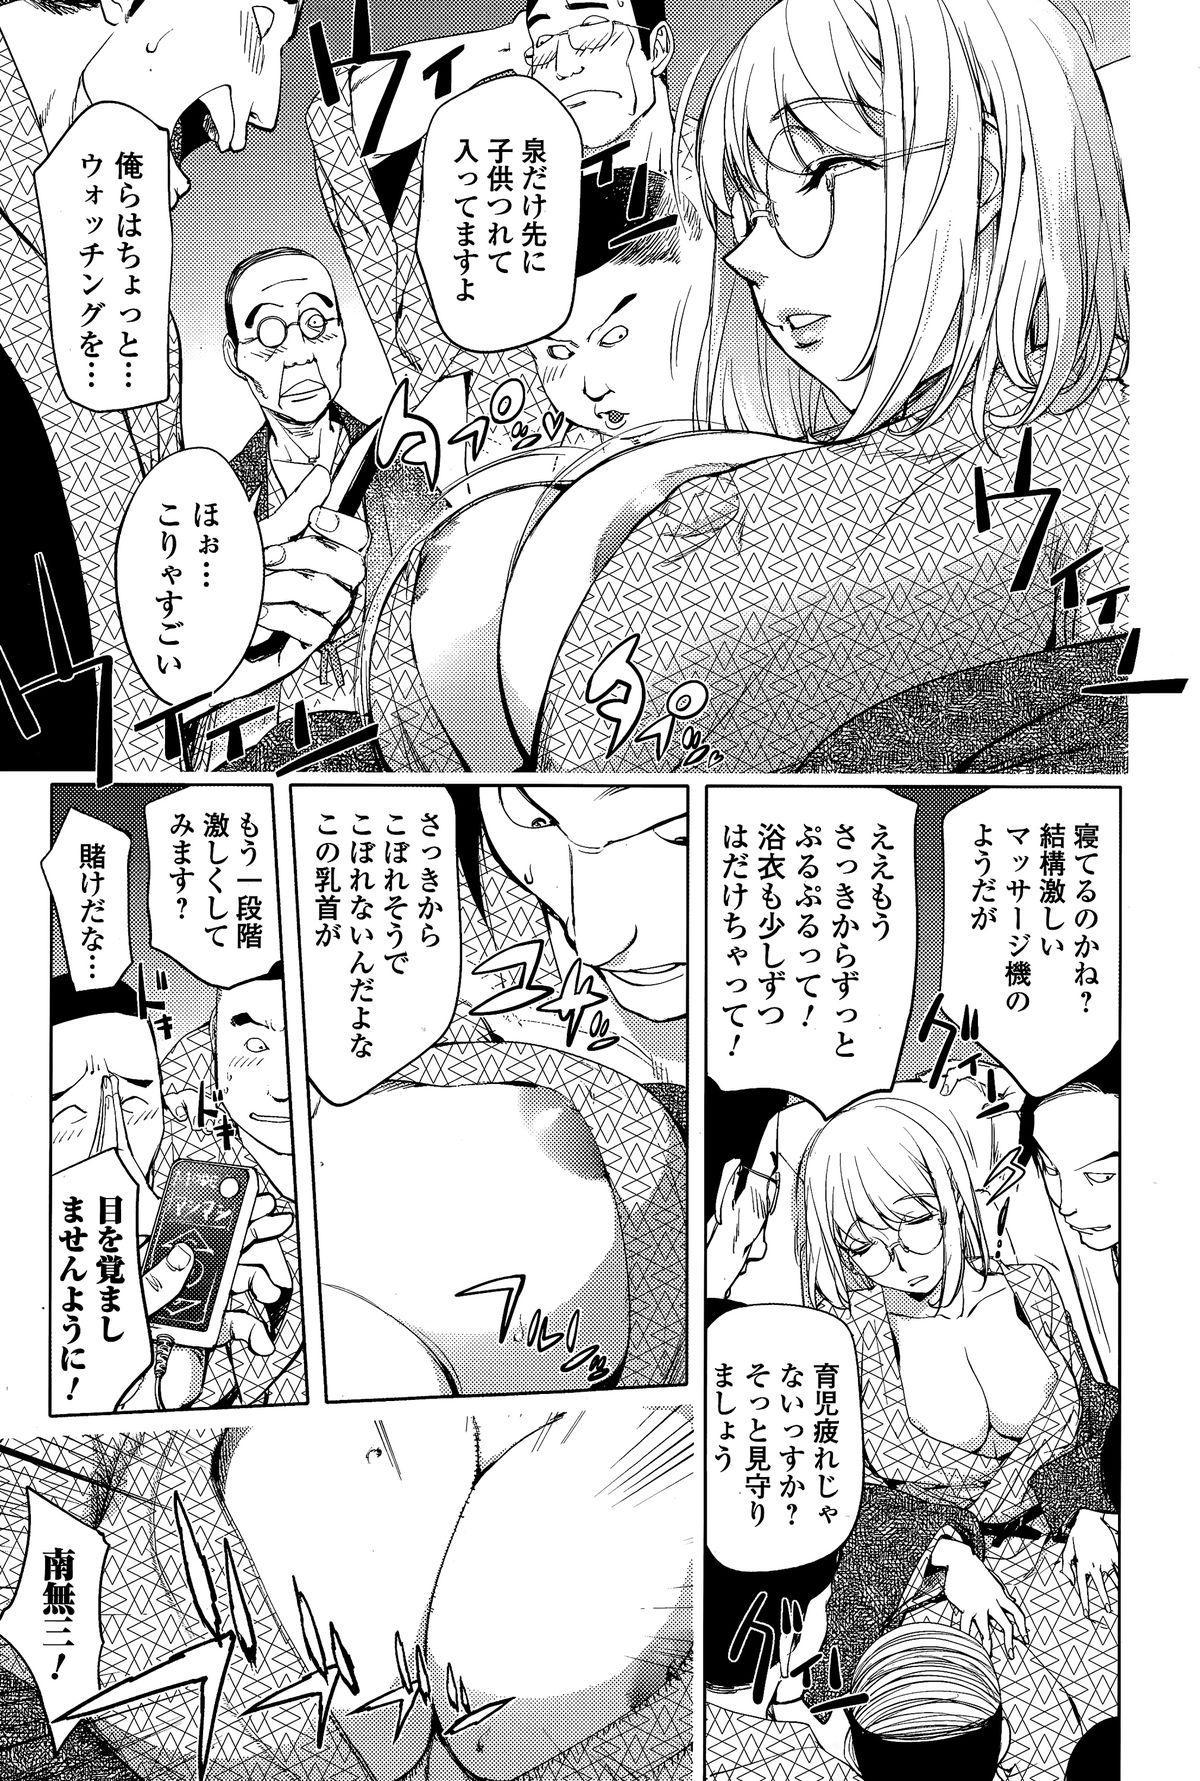 Comic Toutetsu 2015-02 Vol. 3 82